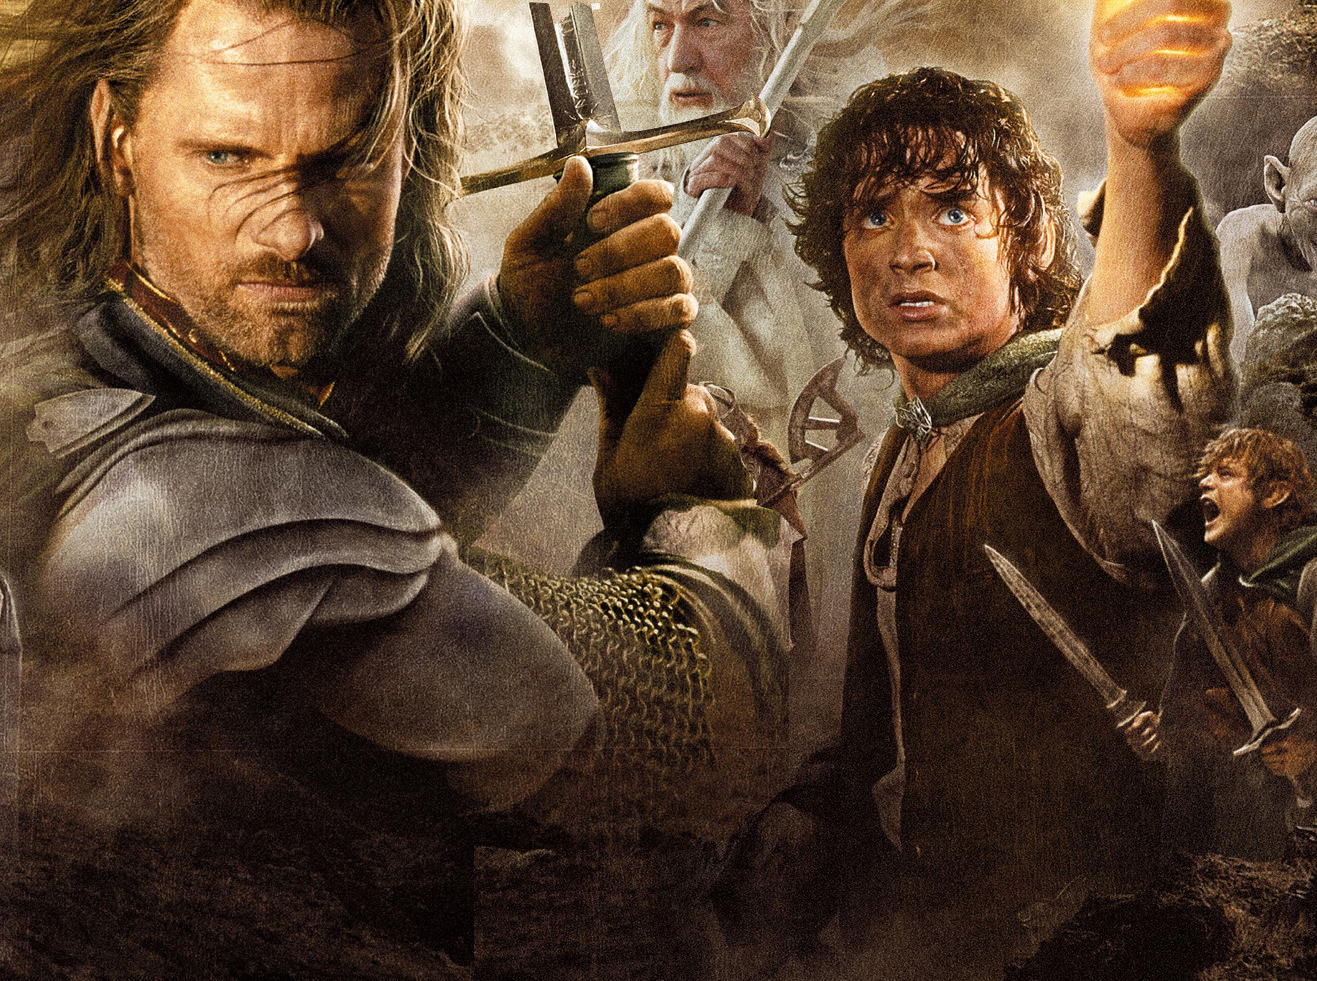 http://2.bp.blogspot.com/-49jT91I7tCI/Ts5Gzosrk-I/AAAAAAAACIE/fBqyoSNtmQc/s1600/viggo_mortensen_aragorn_fordo_Elijah_Wood_the_lord_of_the_rings_the_hobbit.jpg